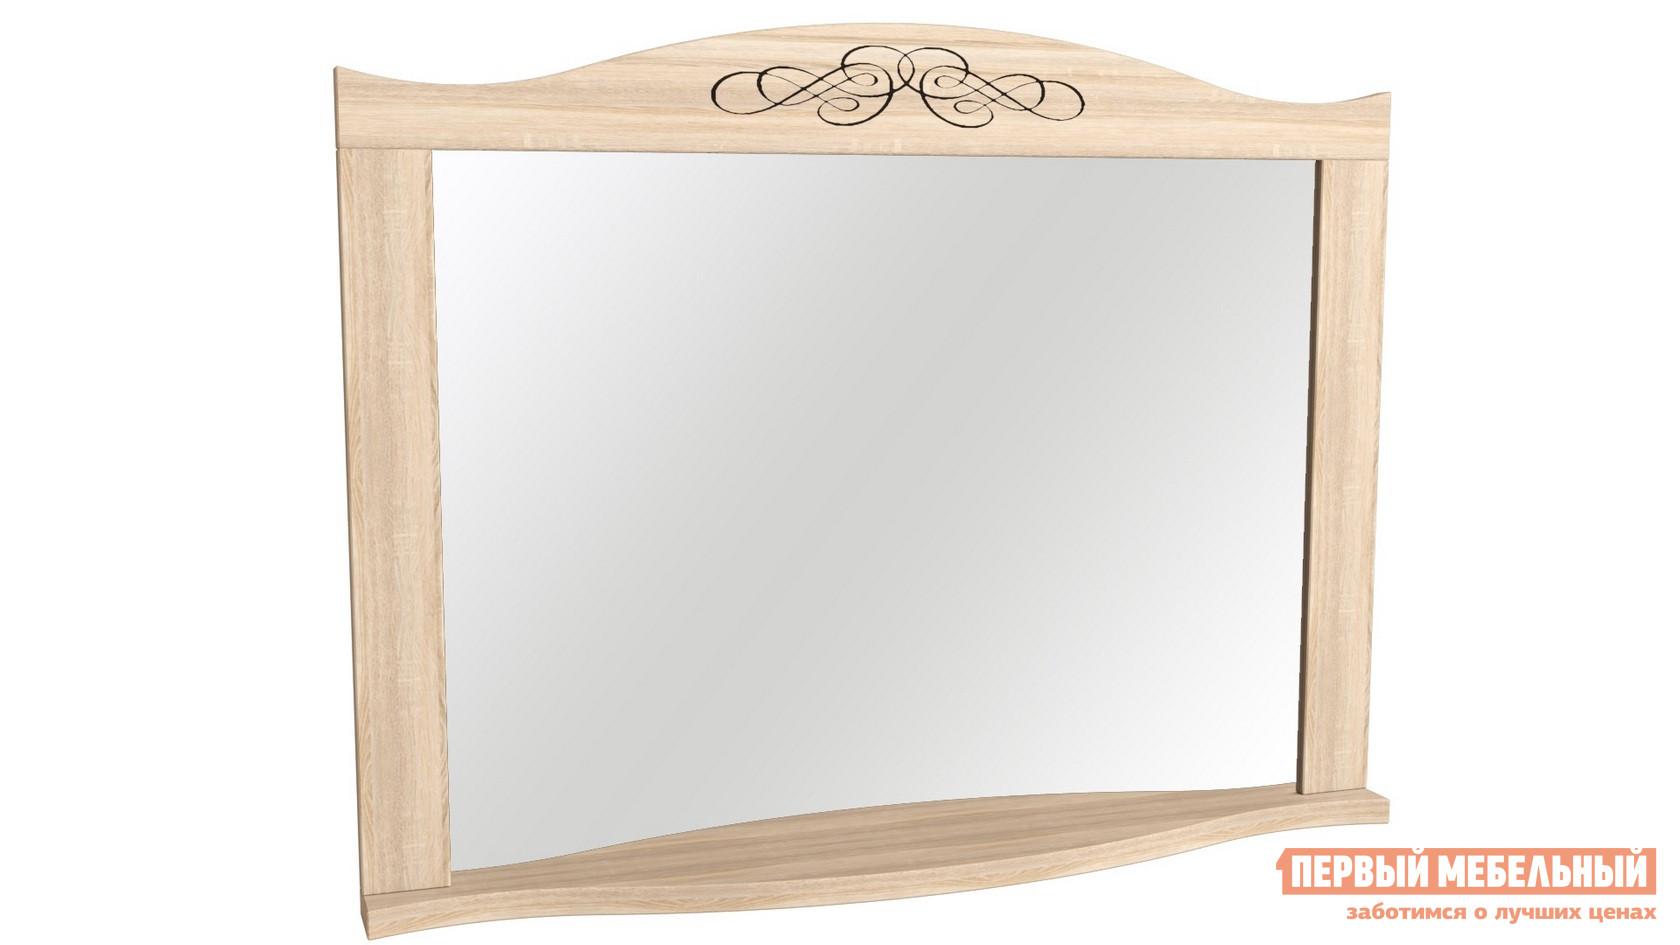 цена на Настенное зеркало ТД Арника ADELE11 Зеркало настенное